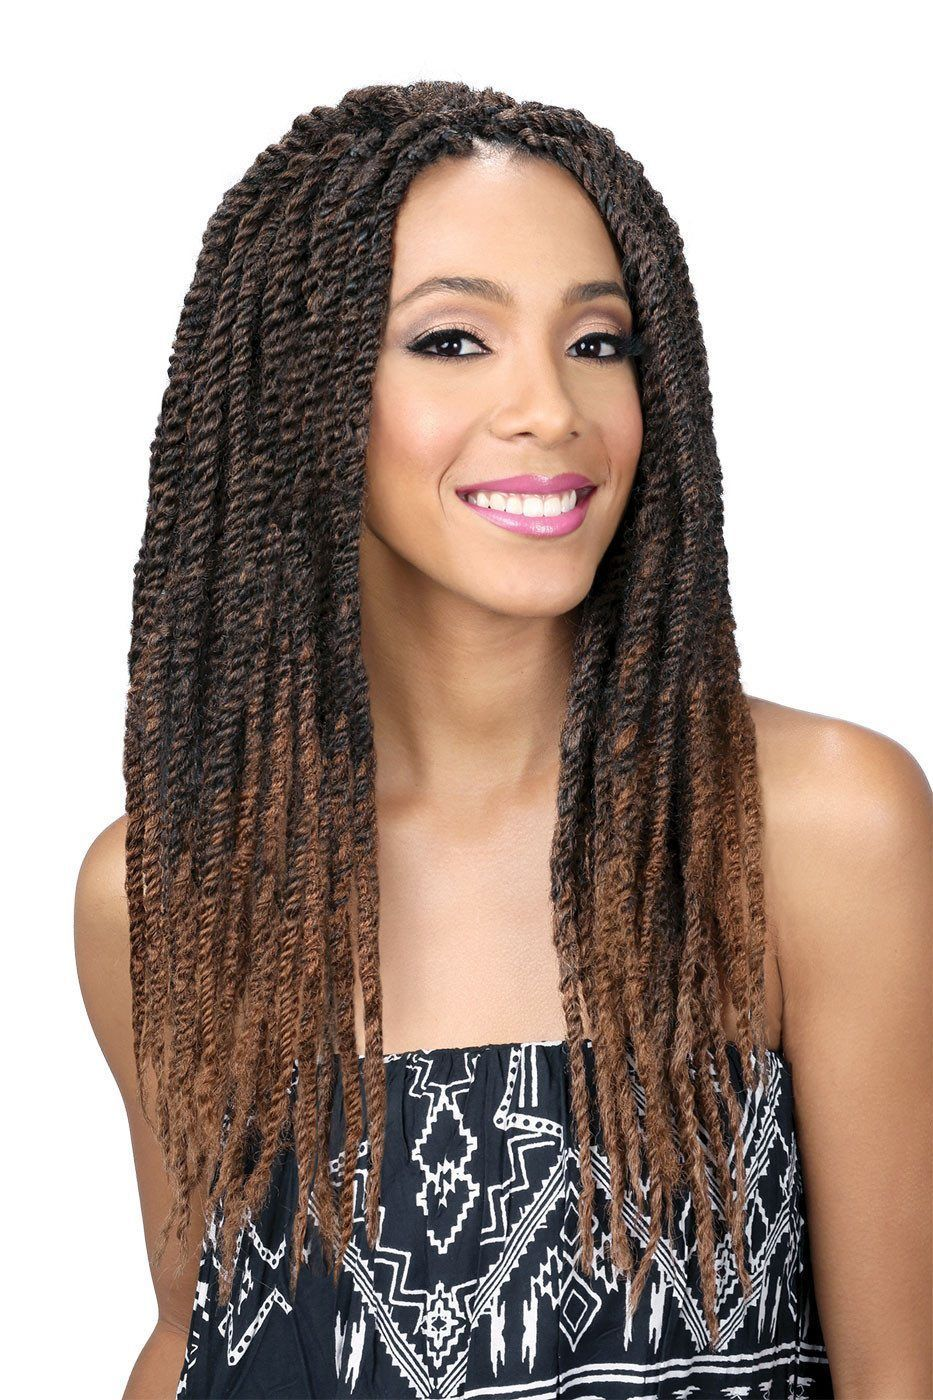 Layered Braids Hairstyles Bobbi Boss African Roots Braid Collection Jamaica Rasta Braid Up